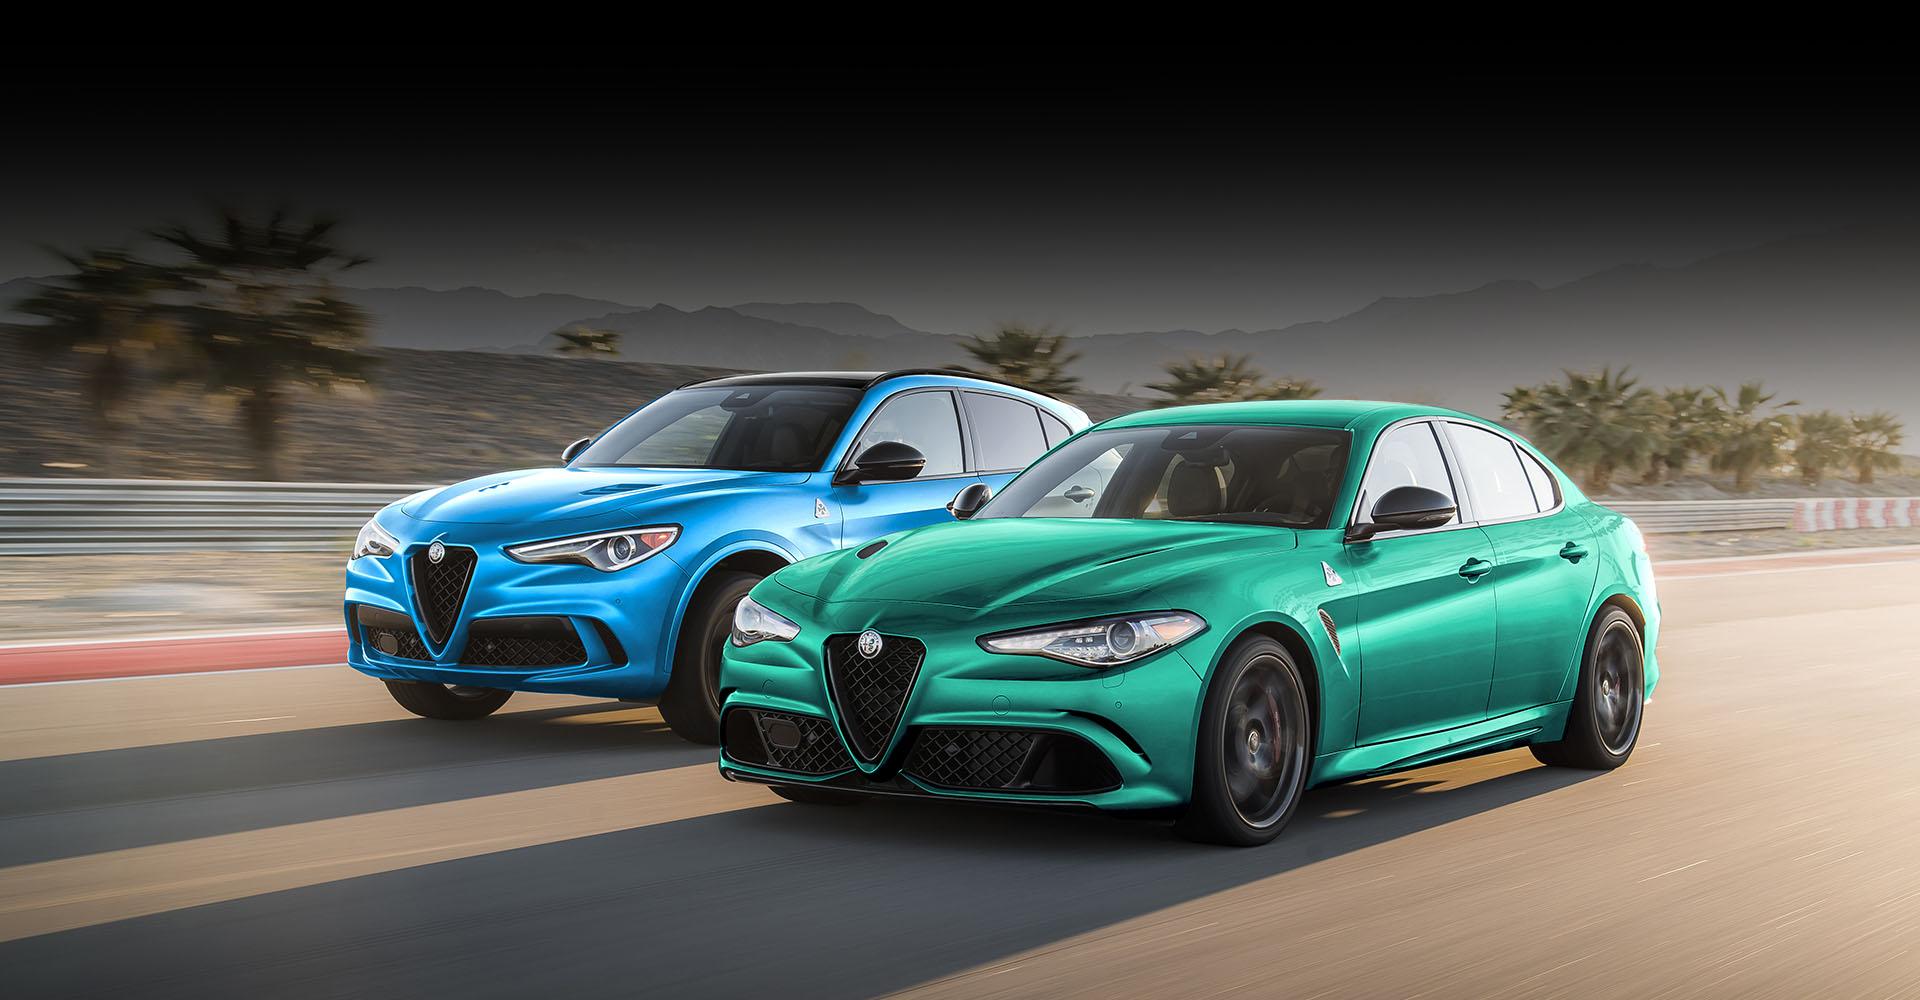 Un Alfa Romeo Giulia Quadrifoglio 2022 verde y un Stelvio Quadrifoglio azul andando a toda velocidad uno al lado del otro en una pista.